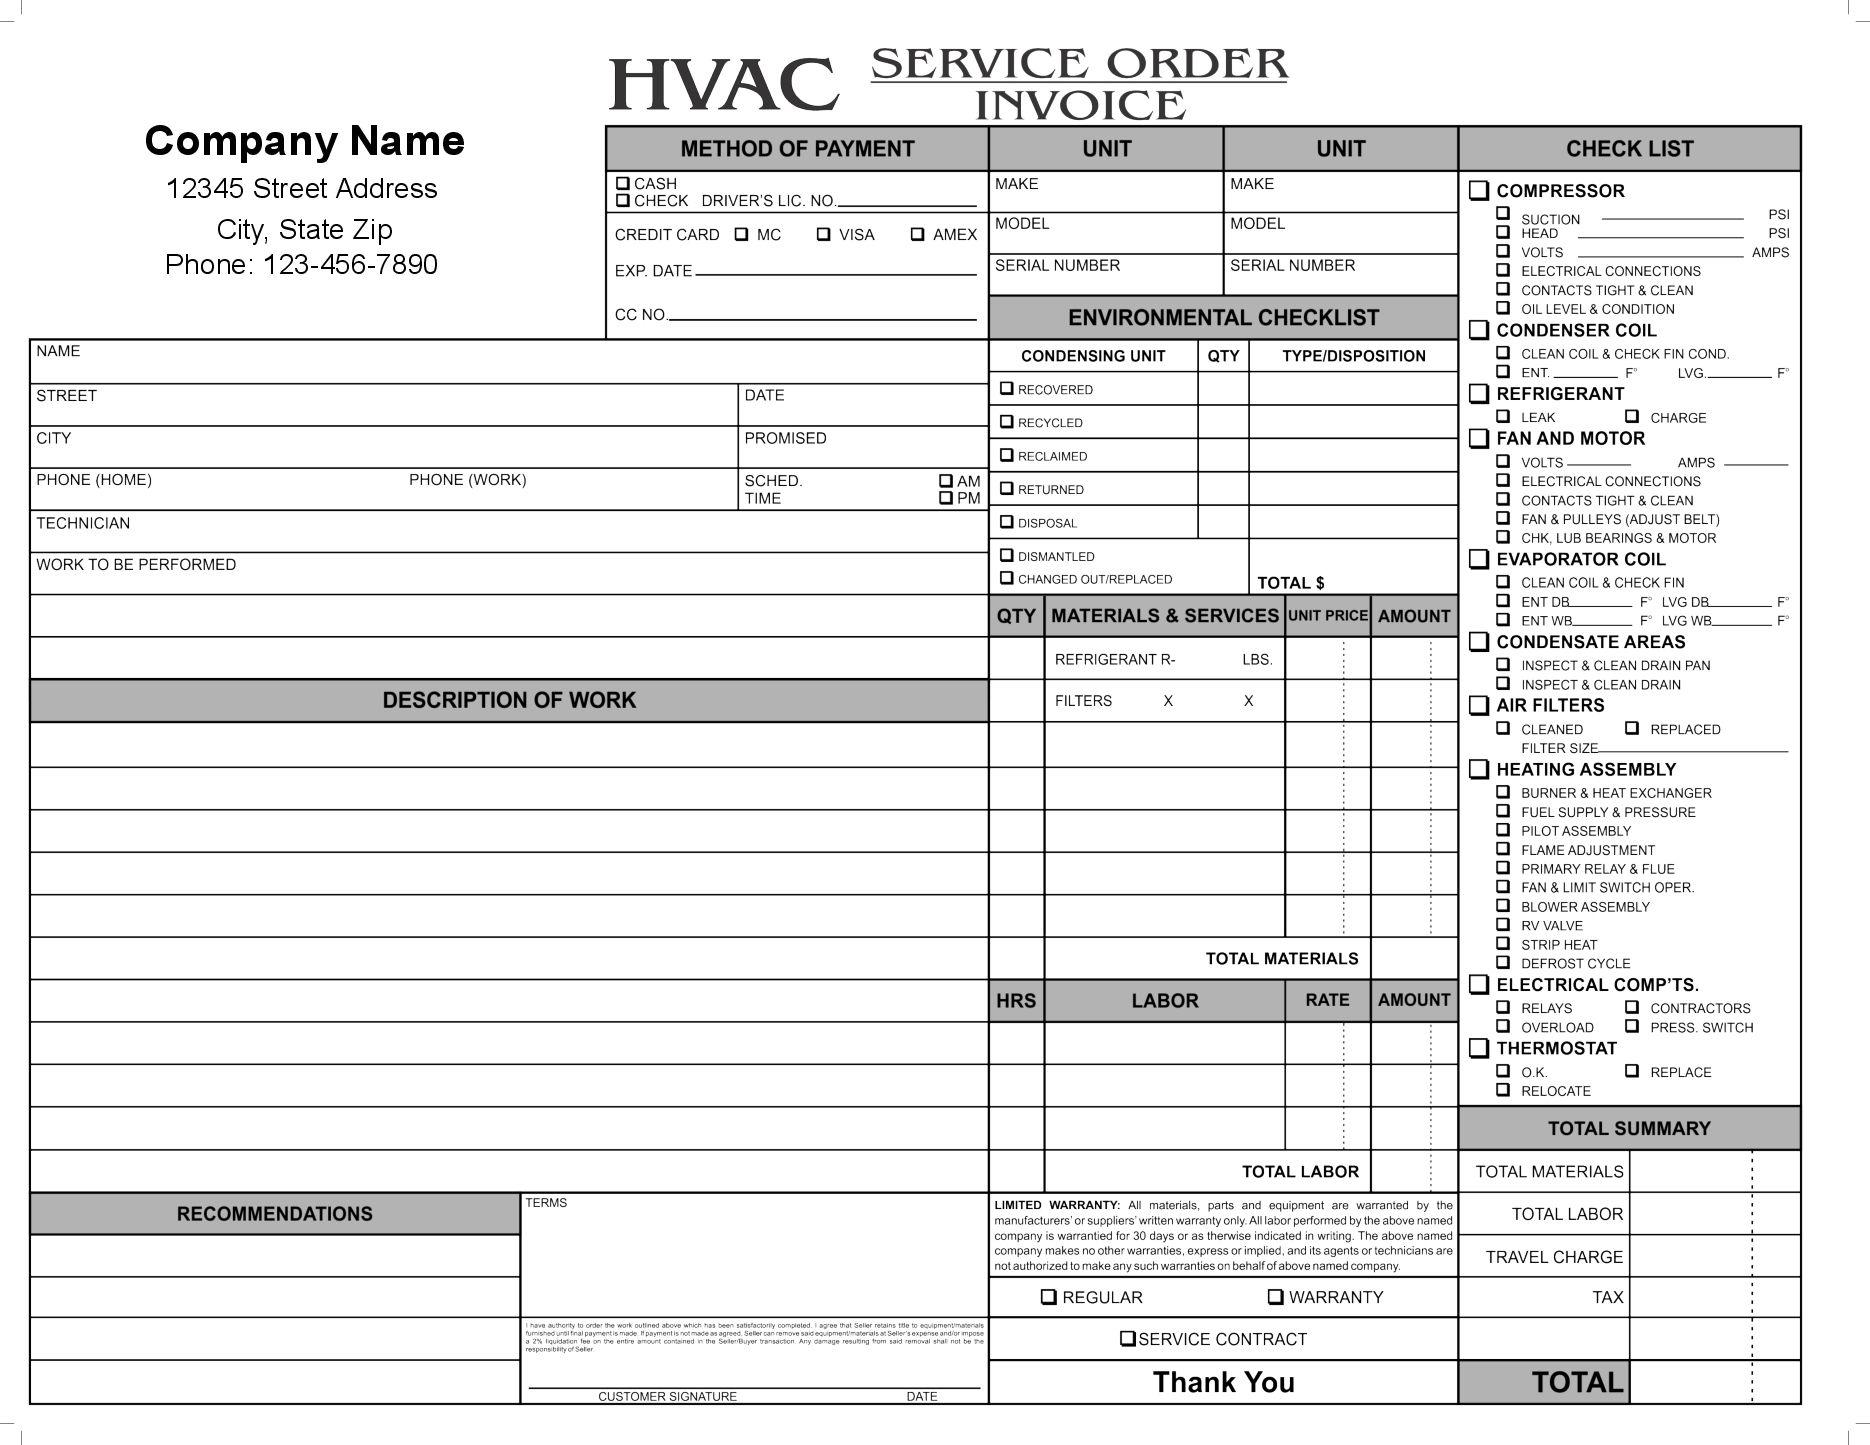 medium resolution of 11 hvac invoice template free top invoice templates hvac invoice template